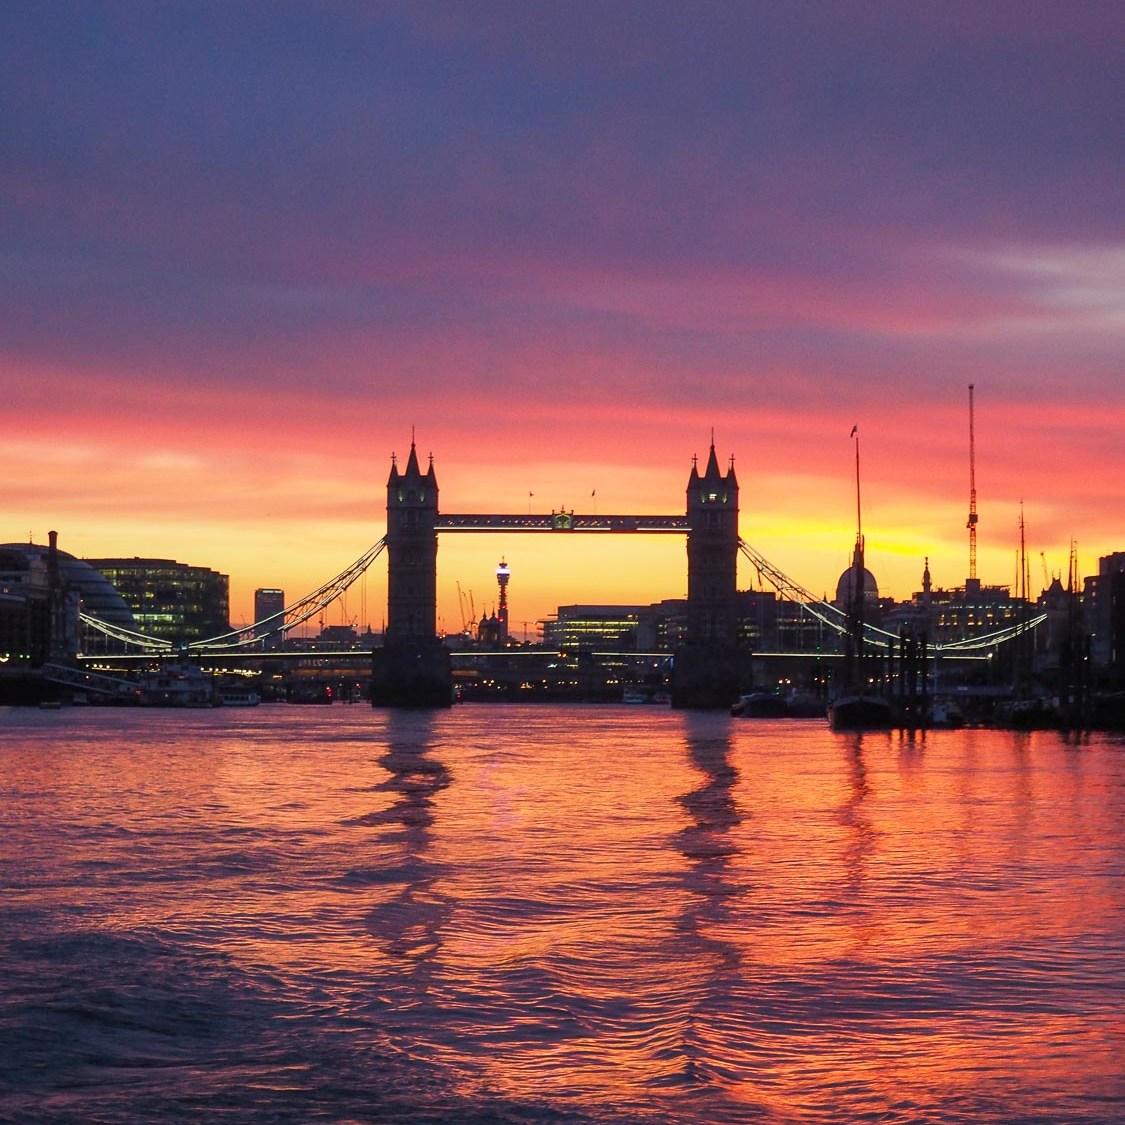 Tower Bridge sunset spot